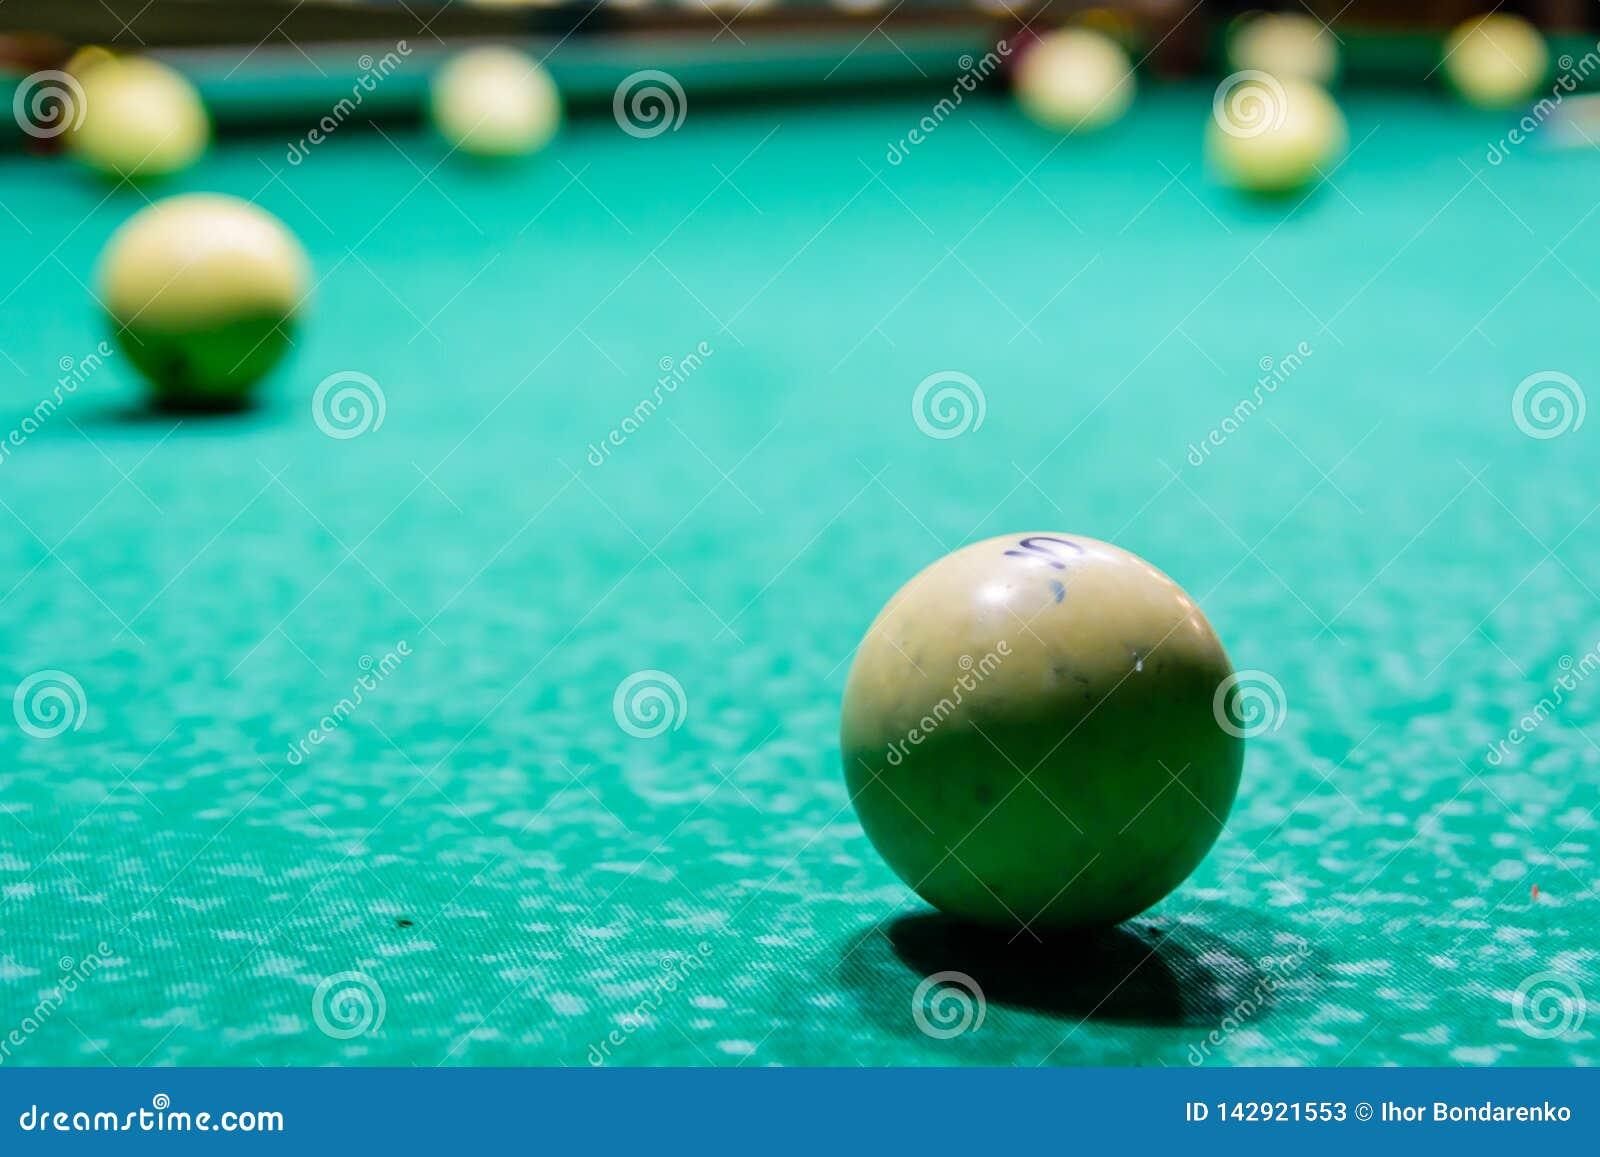 Ballen op de groene doek Russisch biljart